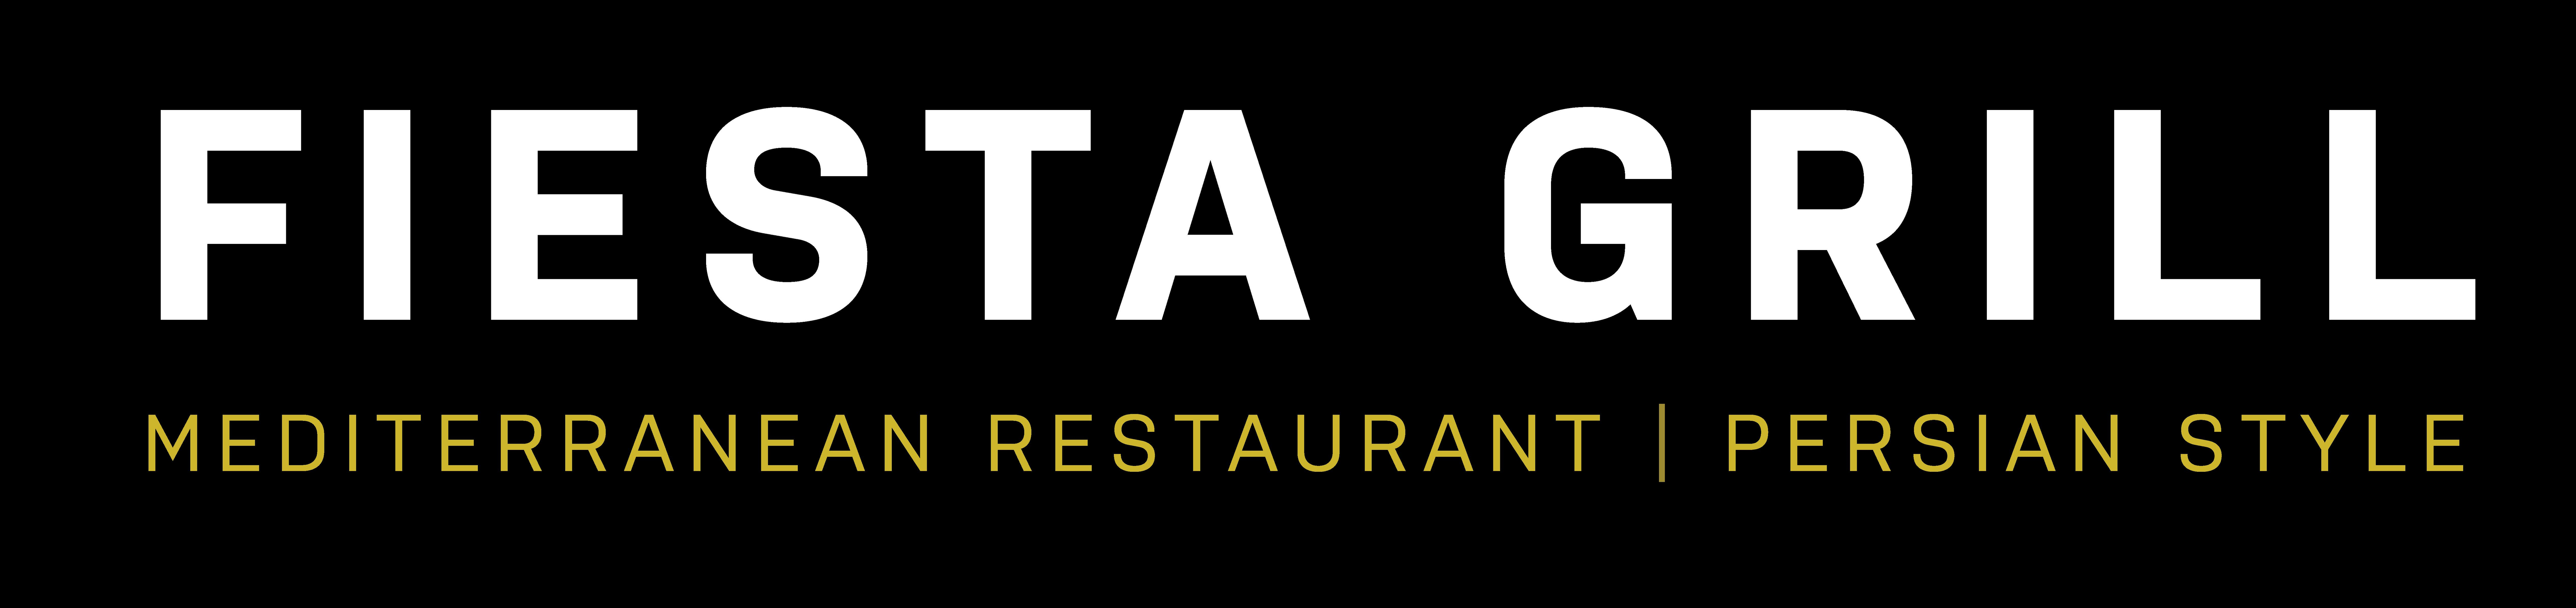 Mediterranean Restaurant   Persian Style